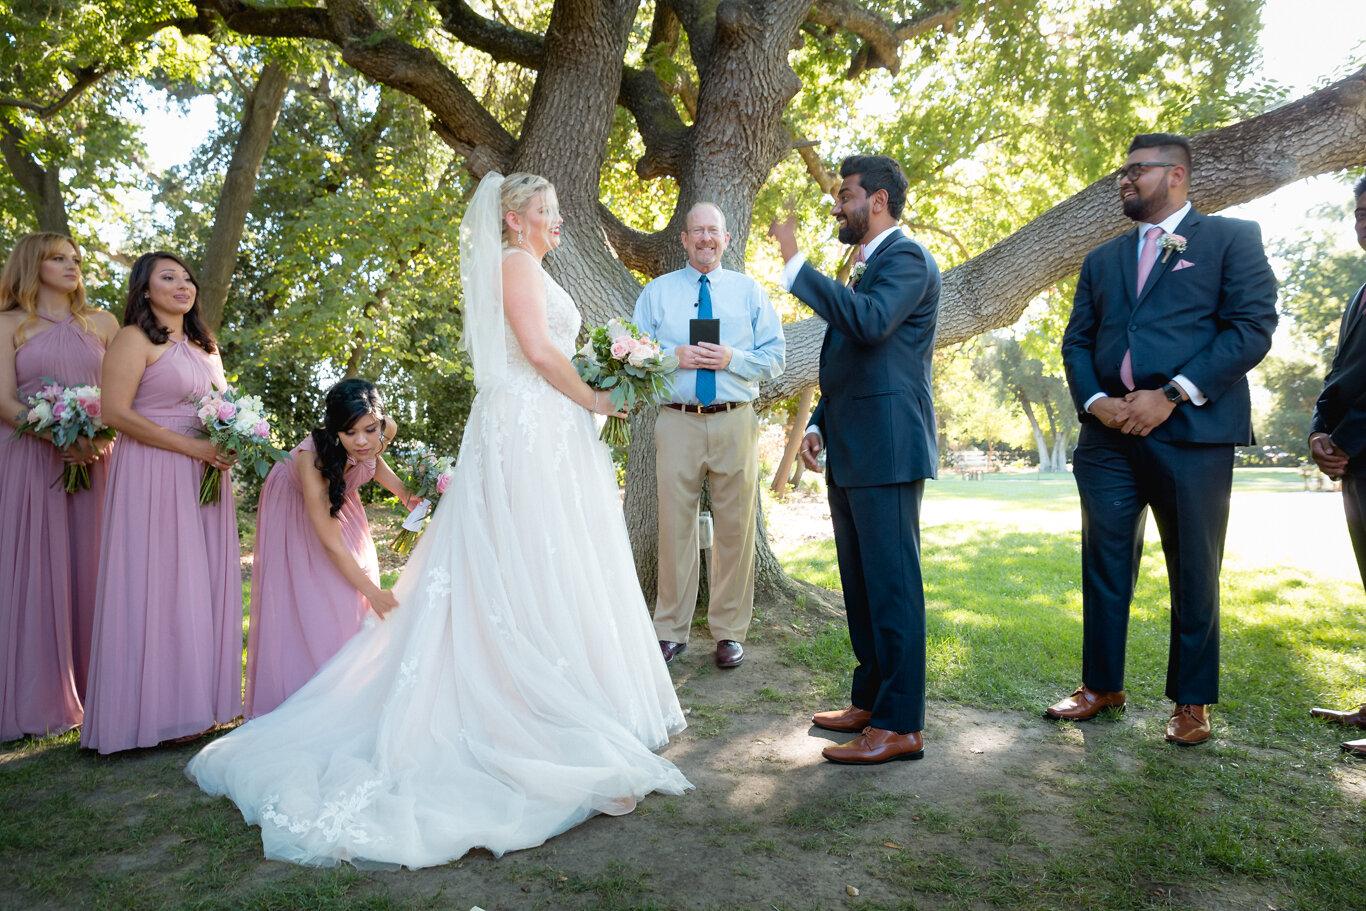 2019.08.24_Emily-Ashir-Wedding-at-the-Maples-5766.jpg